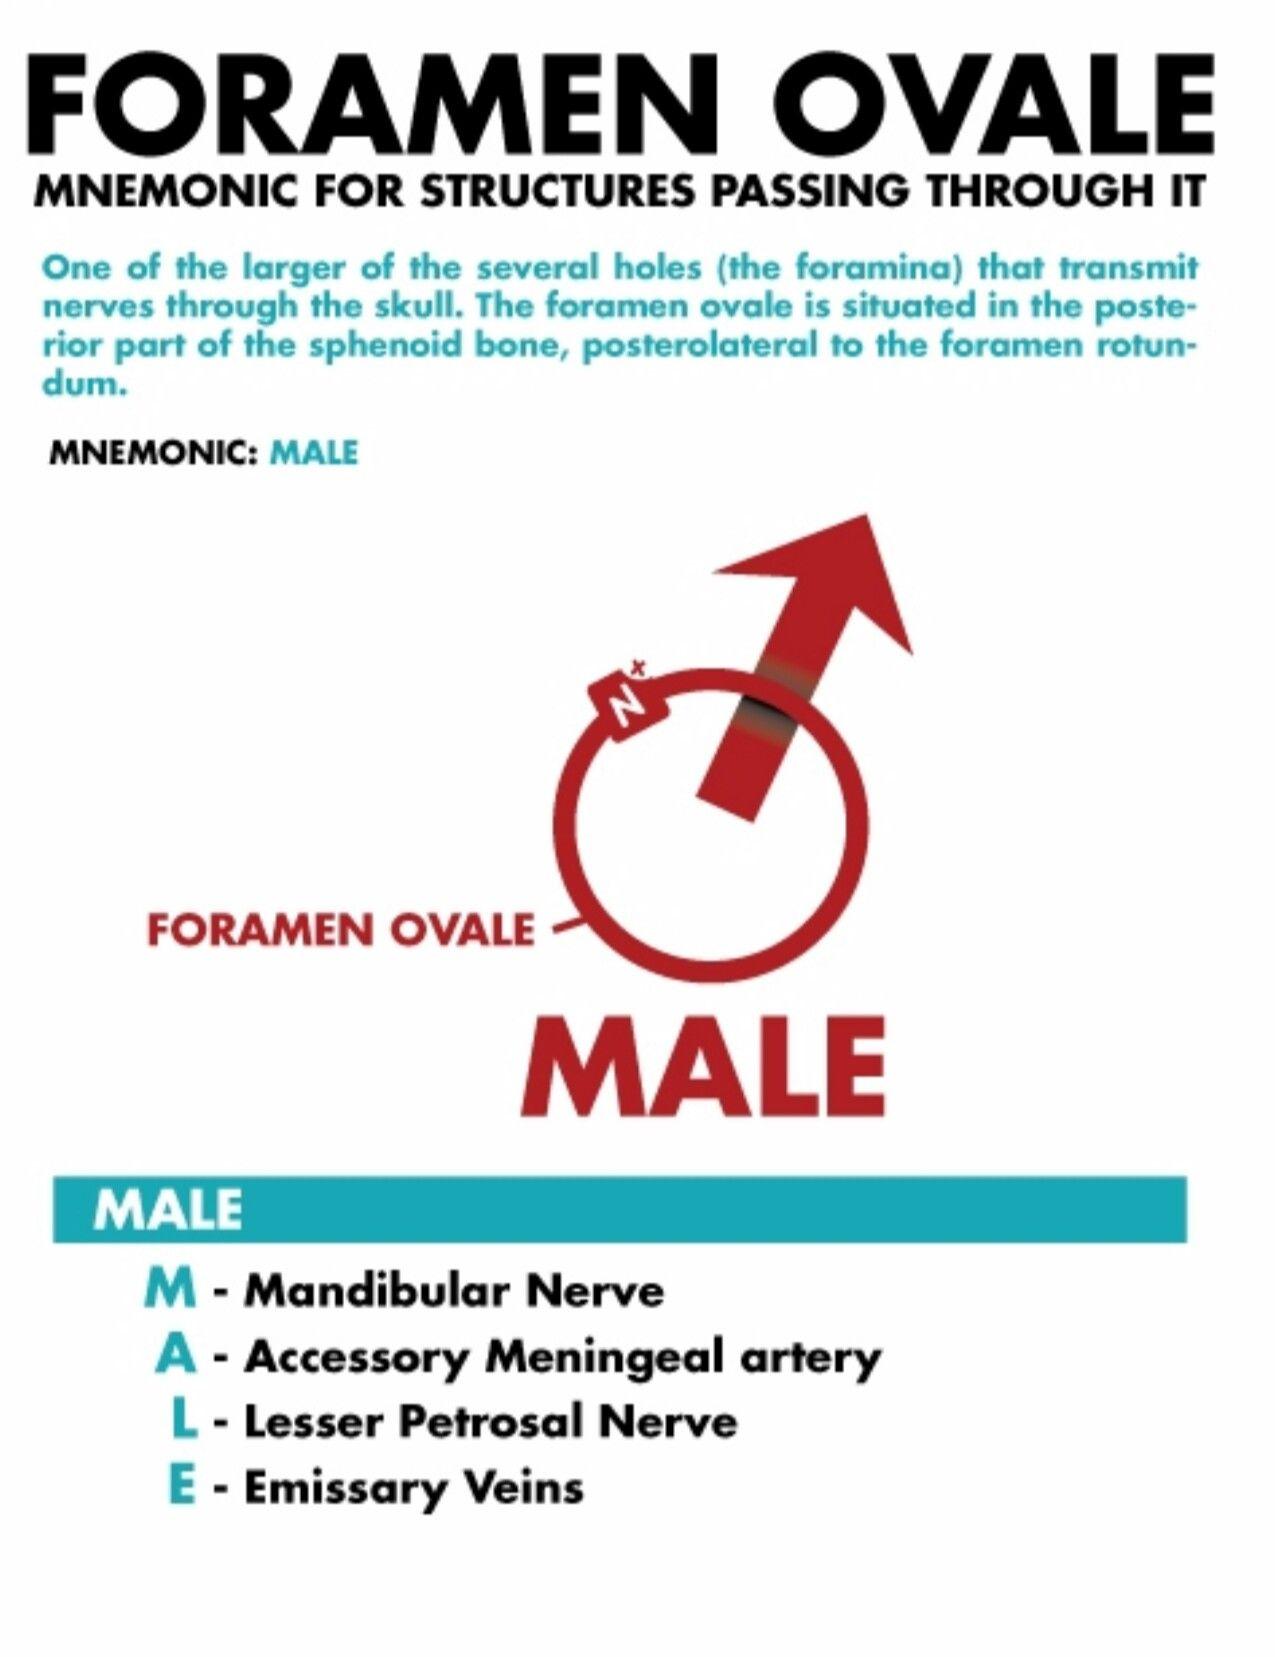 Foramen ovale | Head & Neck Anatomy | Pinterest | Anatomy